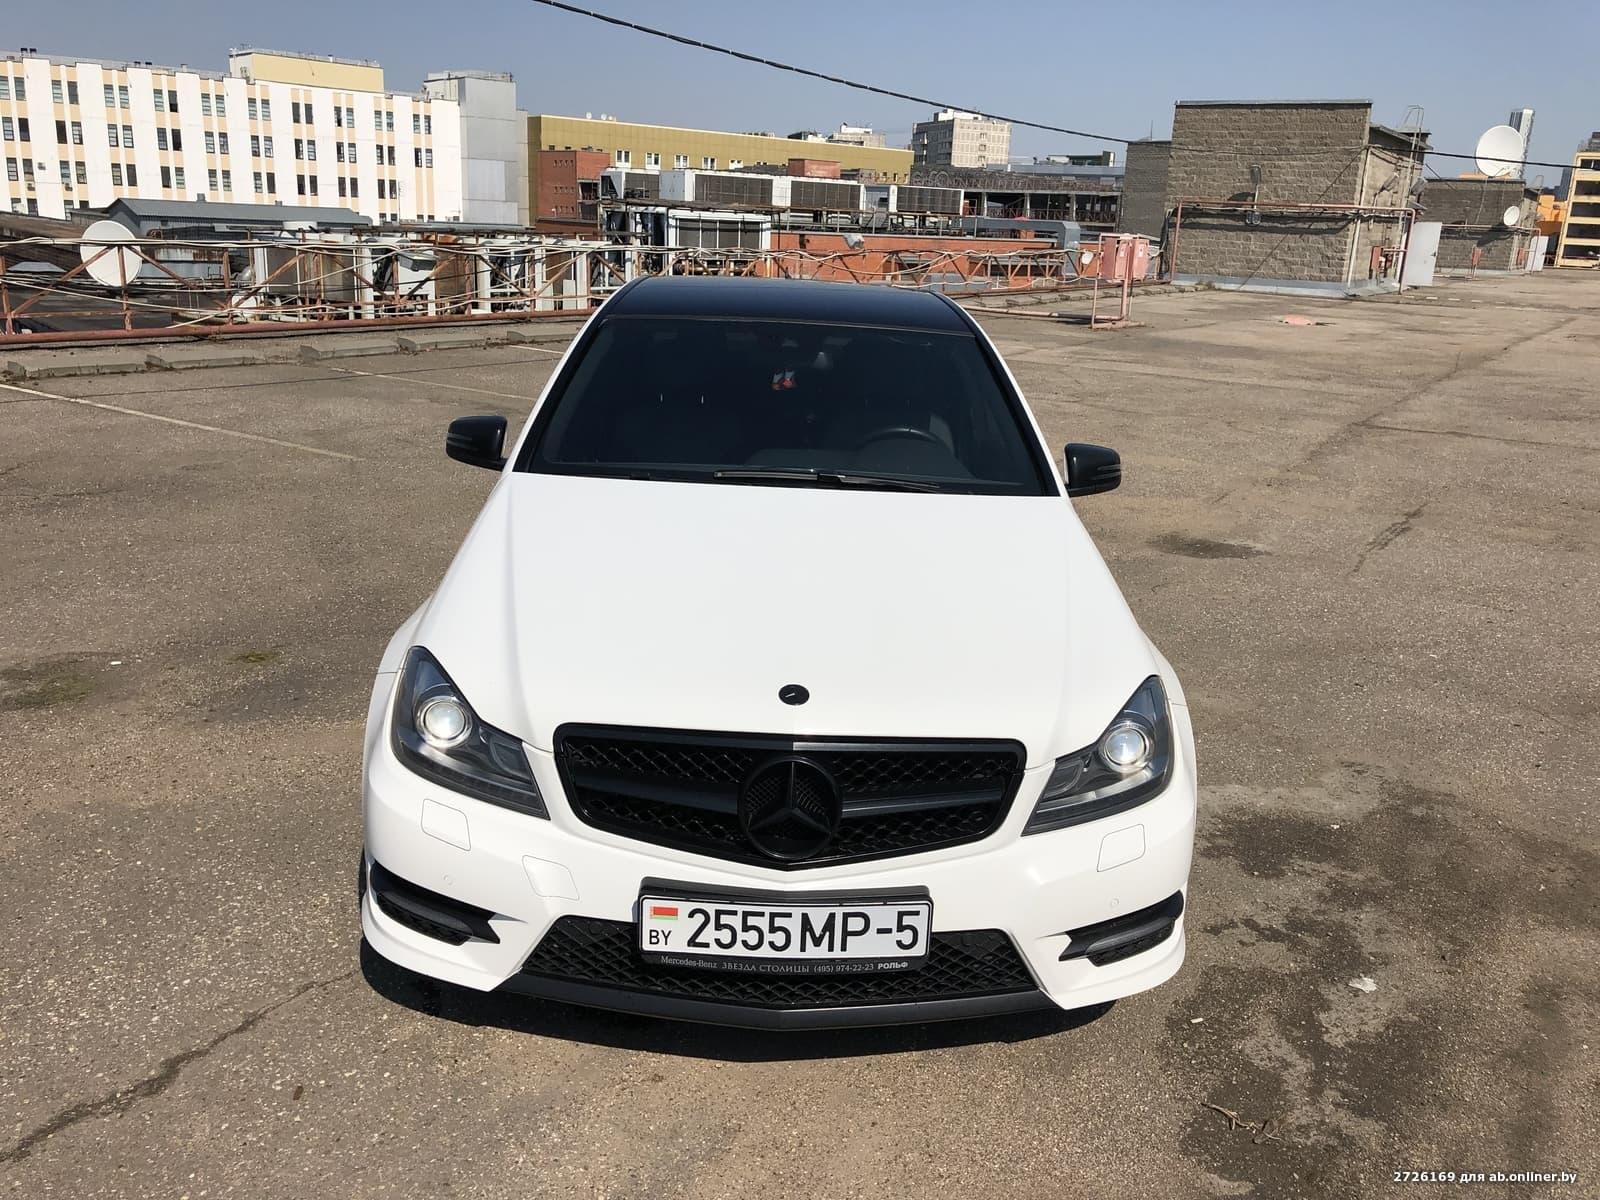 Mercedes-Benz C180 Amg W204